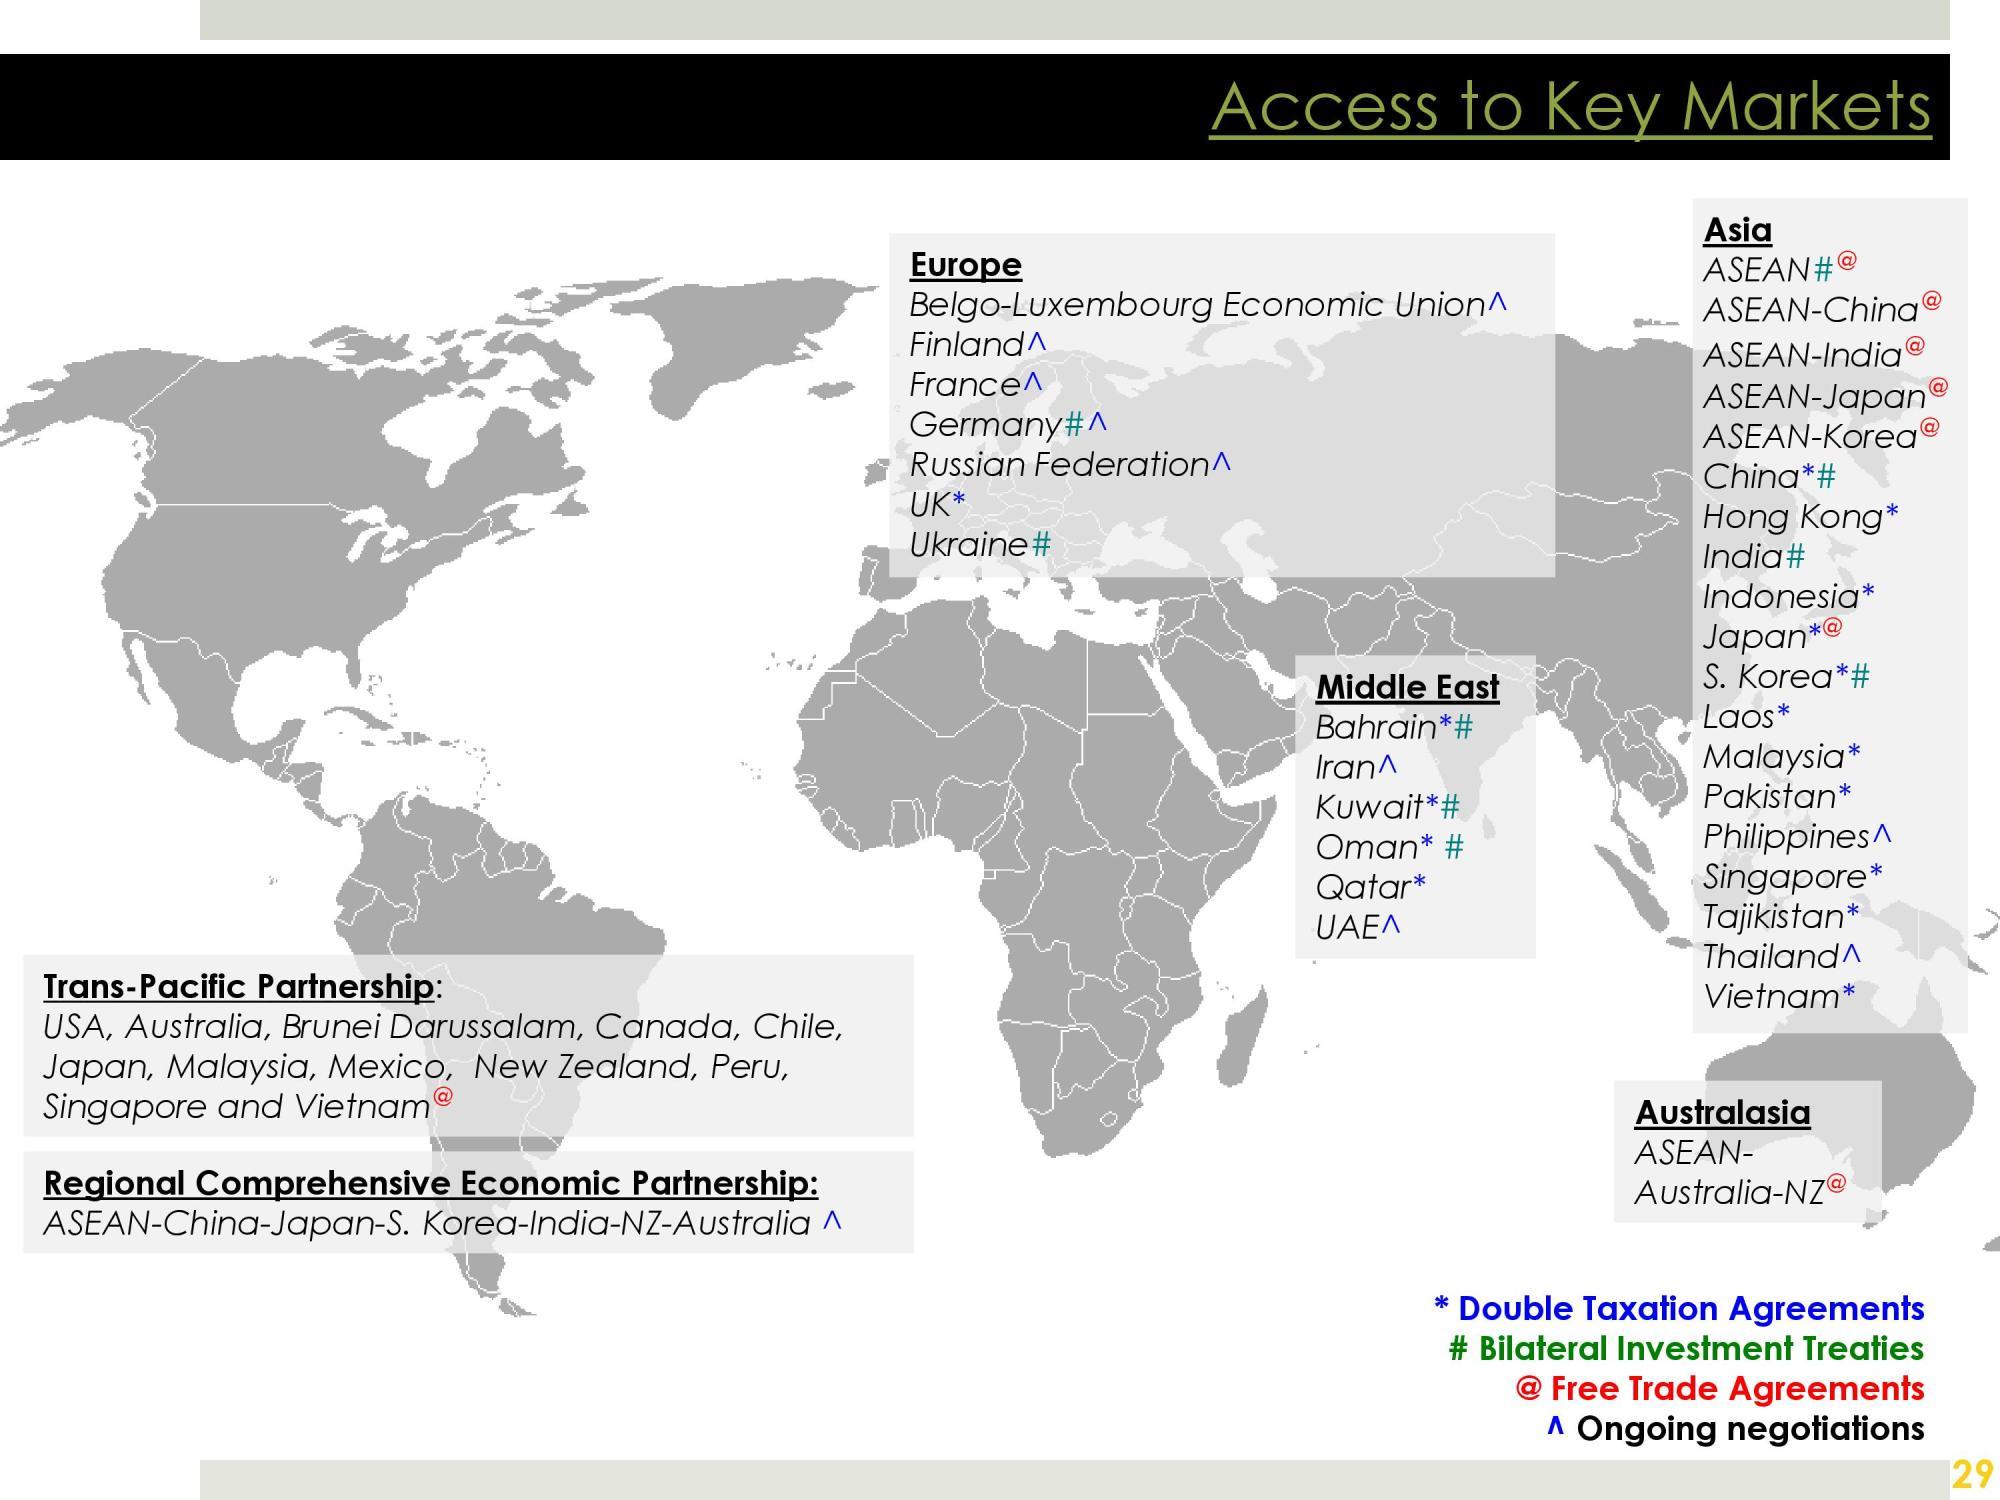 Typar Oman Singapore Free Trade Agreement 12805313 2018